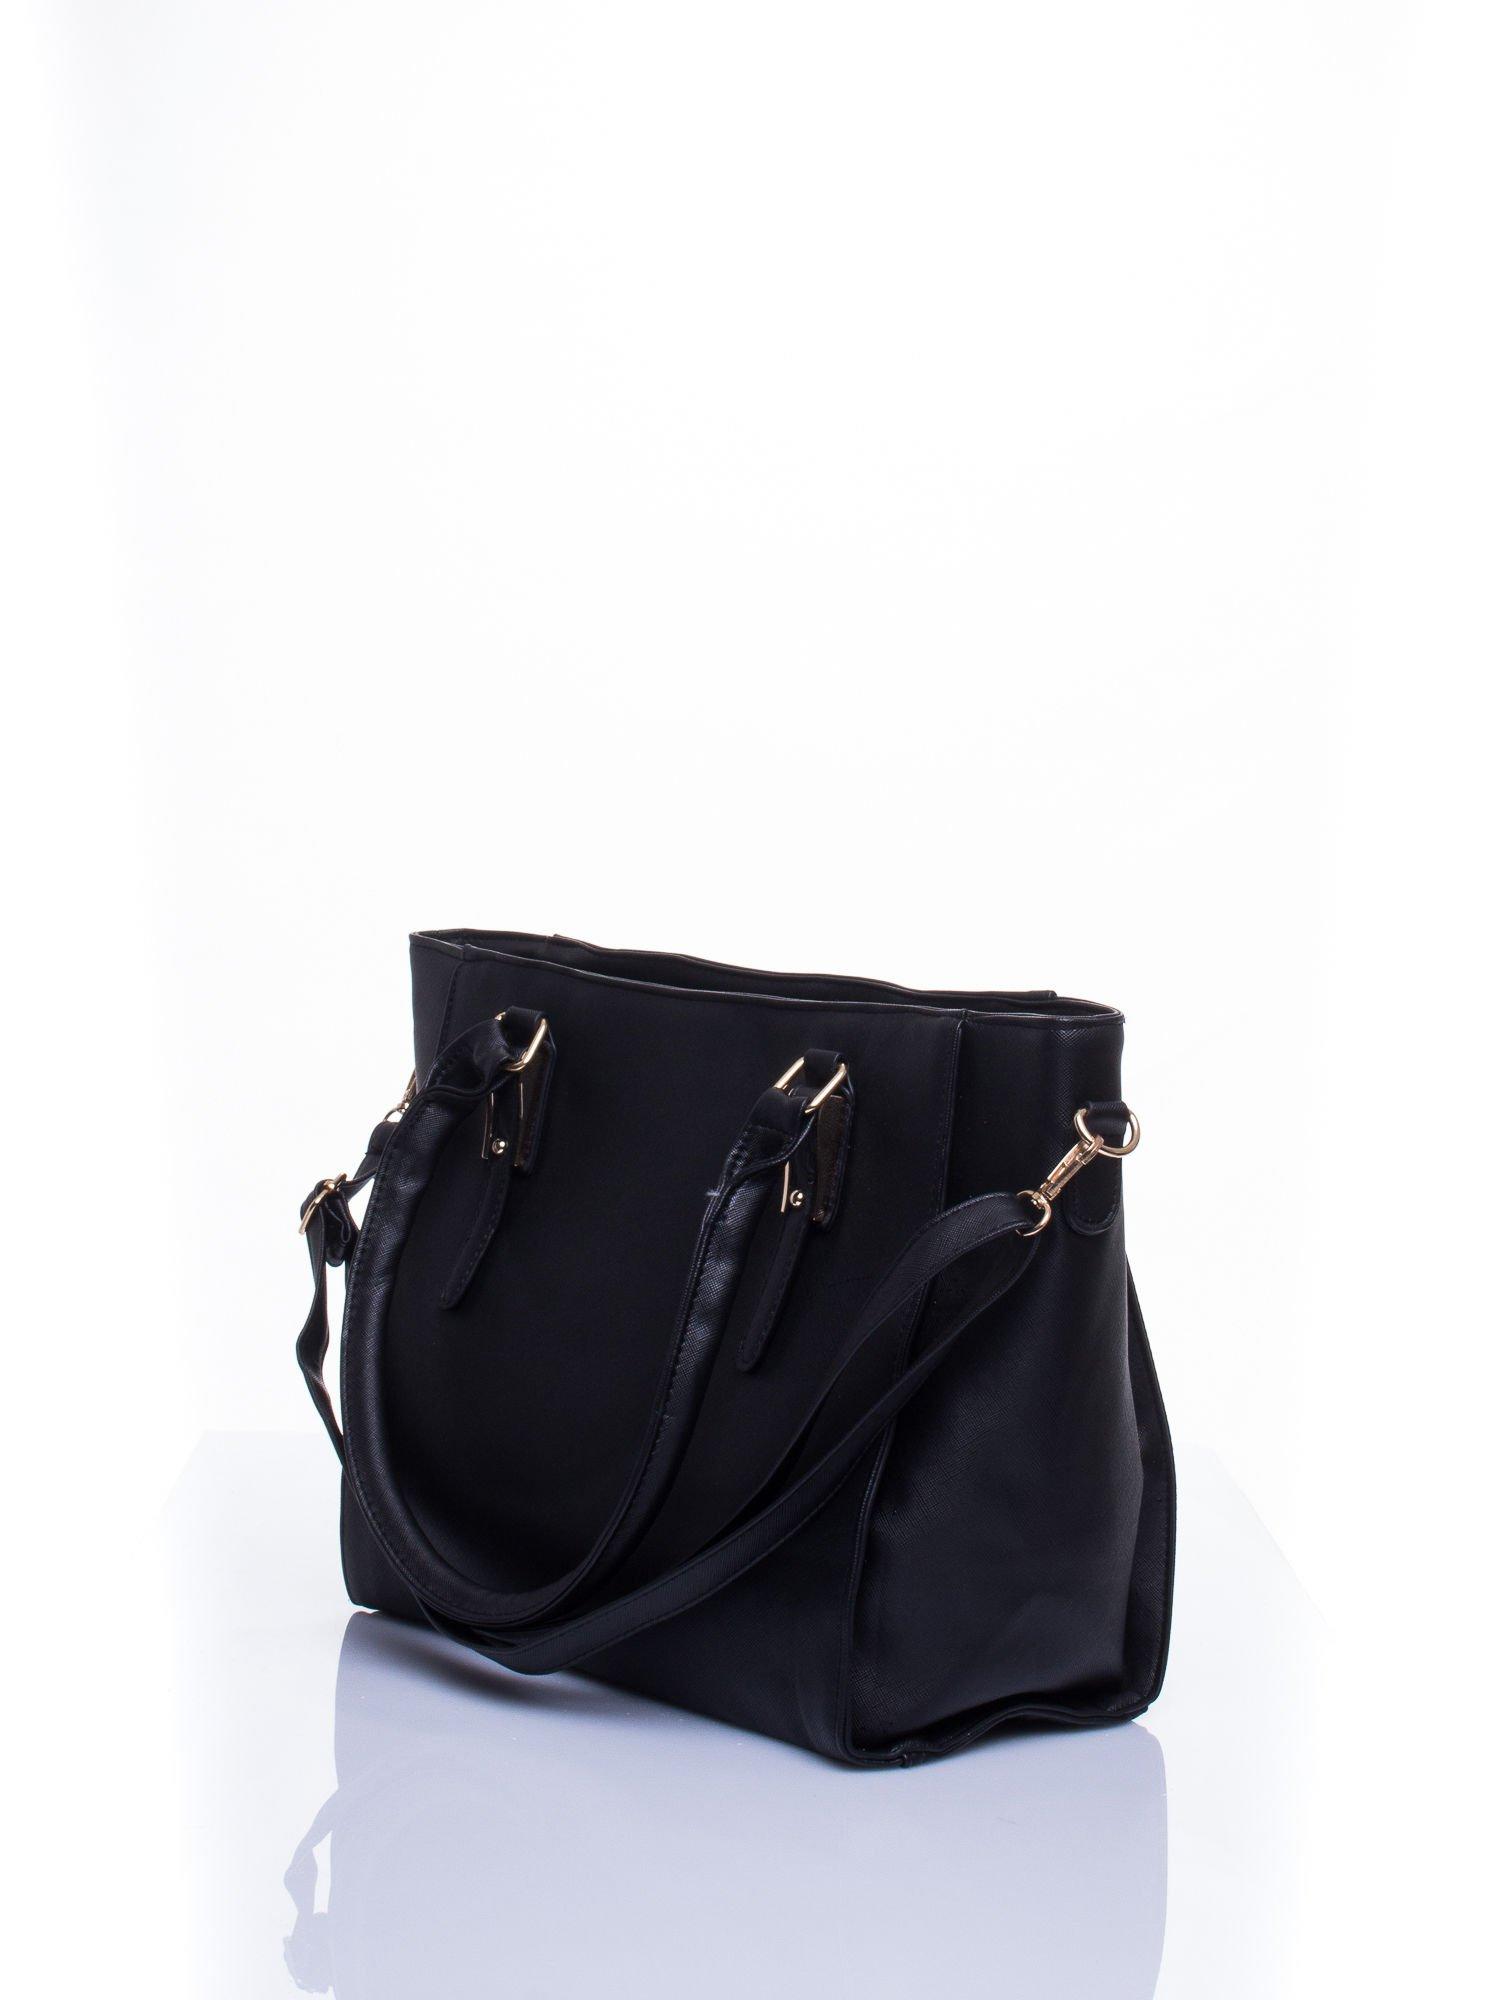 Czarna torba shopper bag z odpinanym paskiem                                  zdj.                                  5